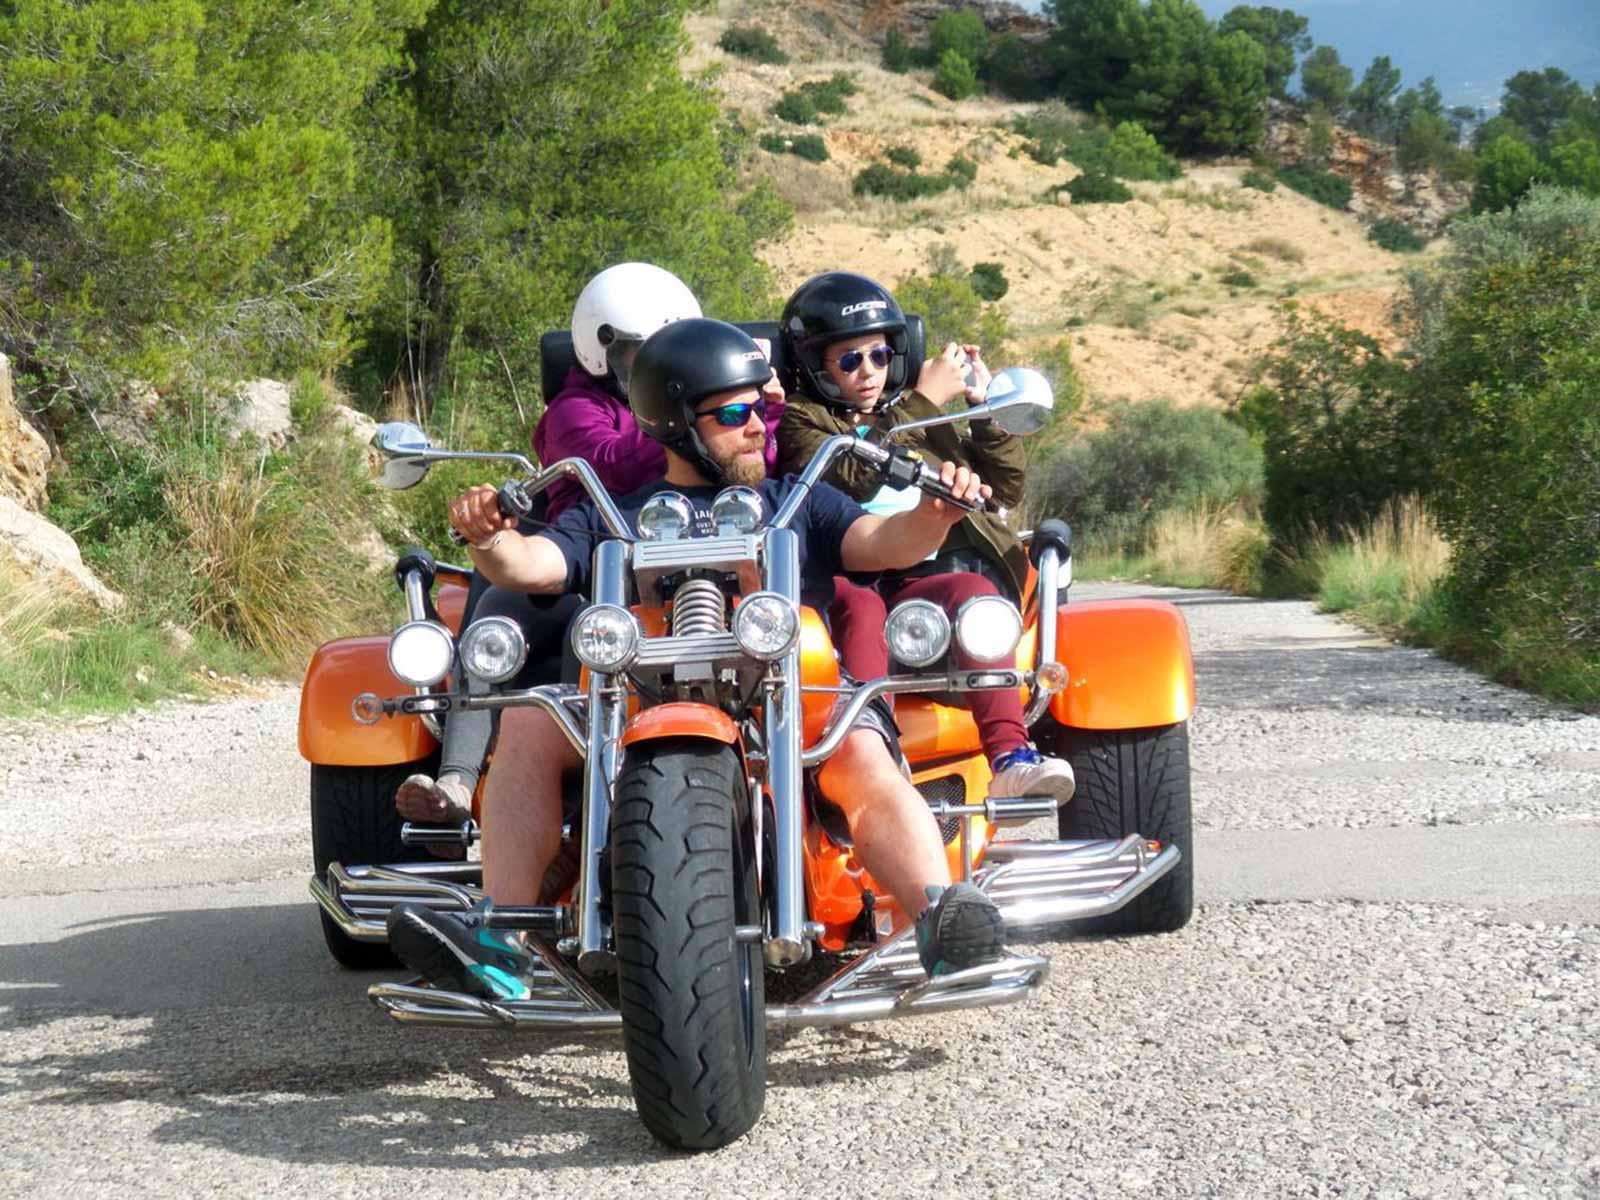 Trike-Mallorca-Trike-Tour-Mallorca-4